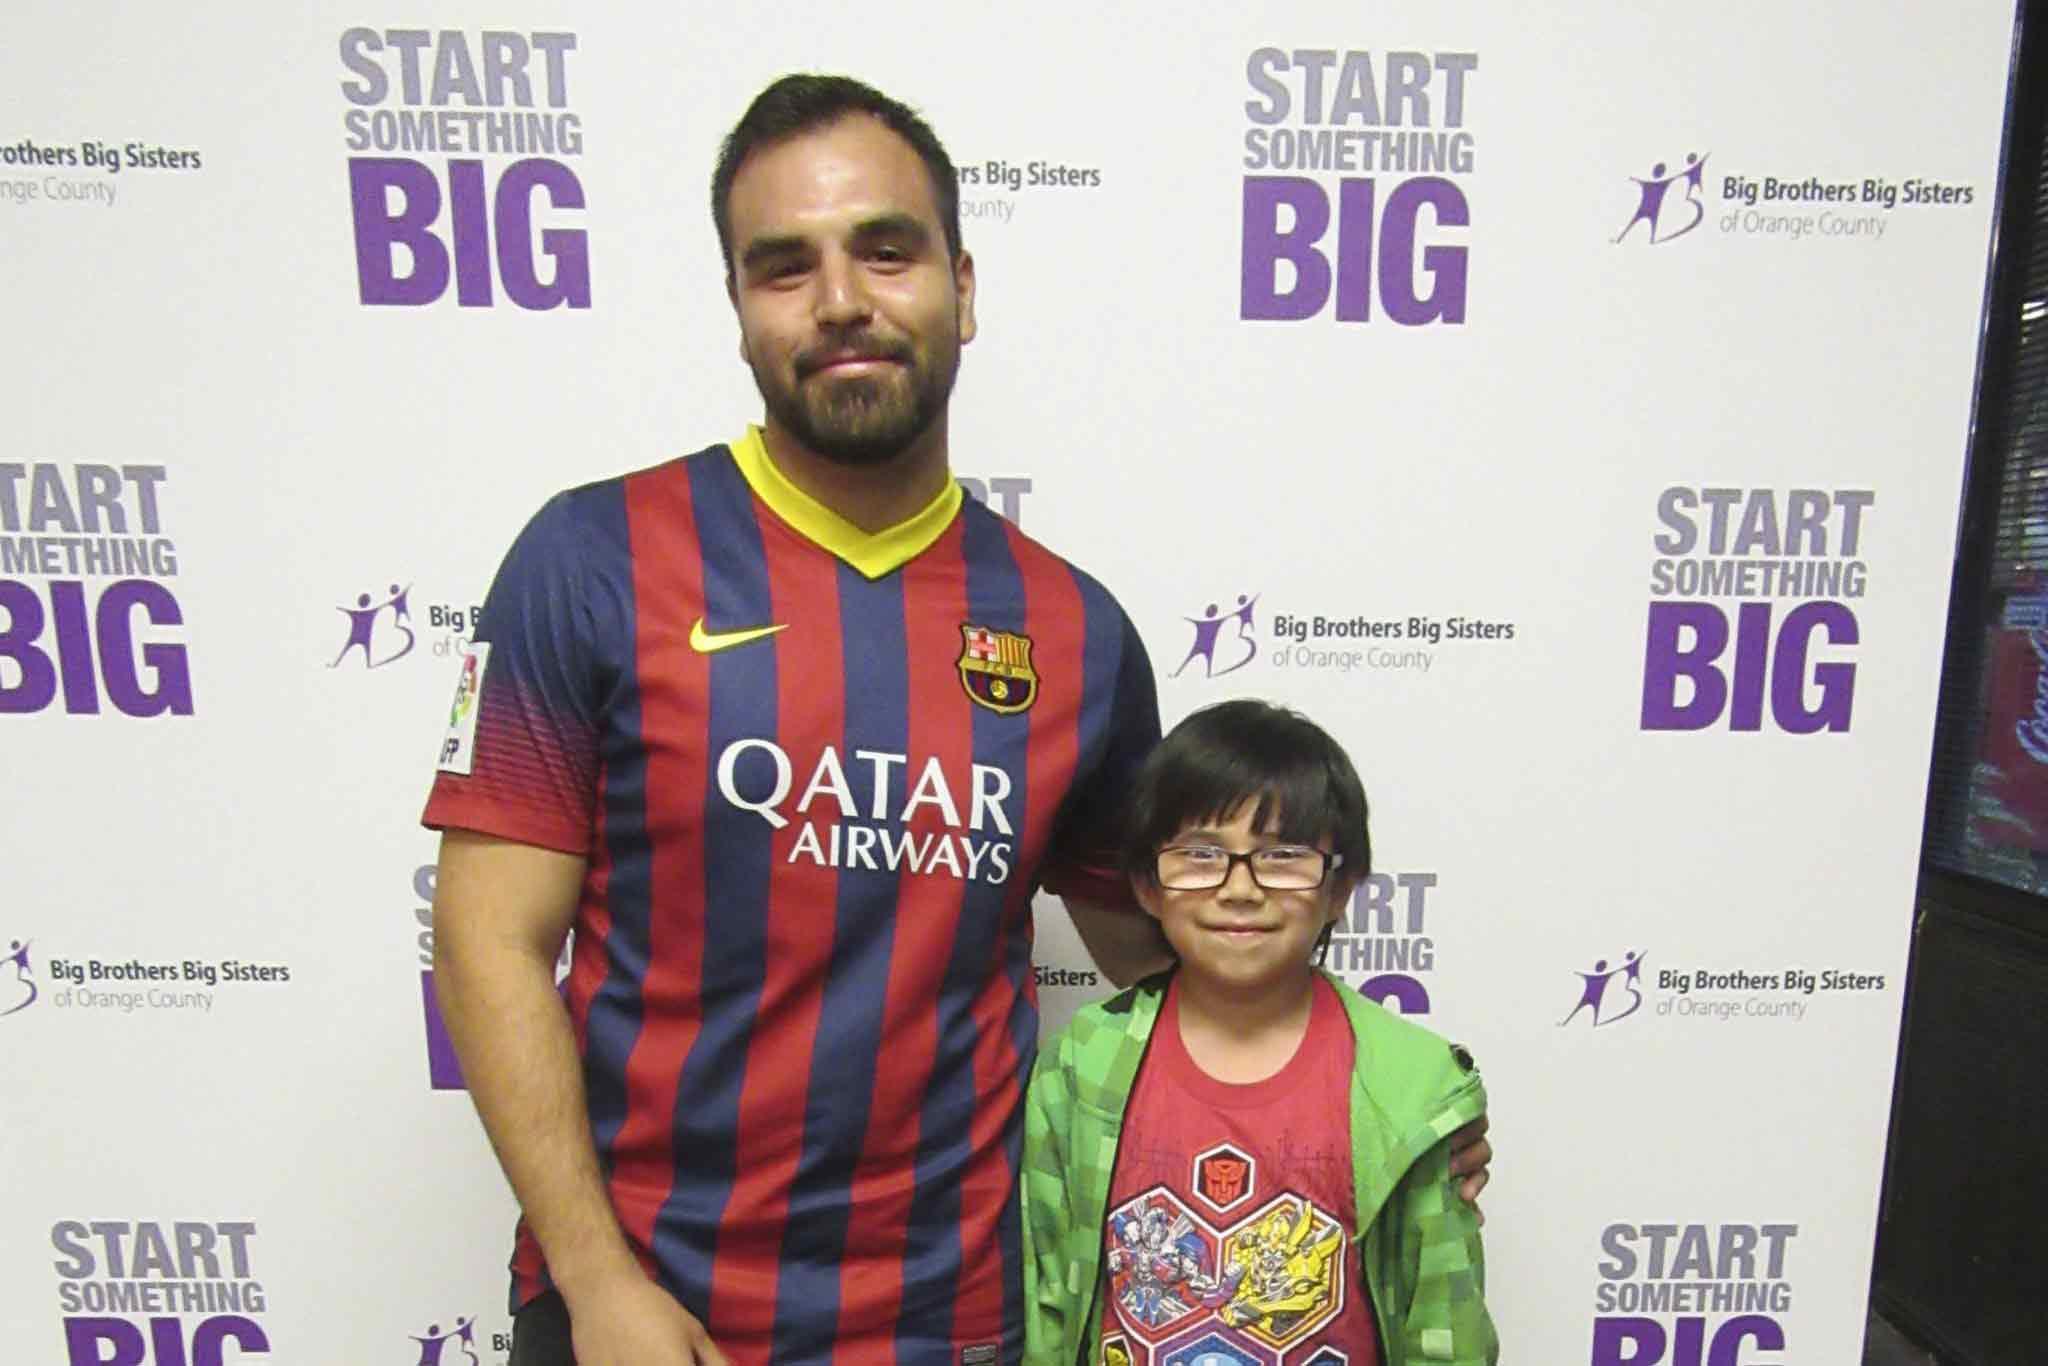 Big brother big sister mentor-5965